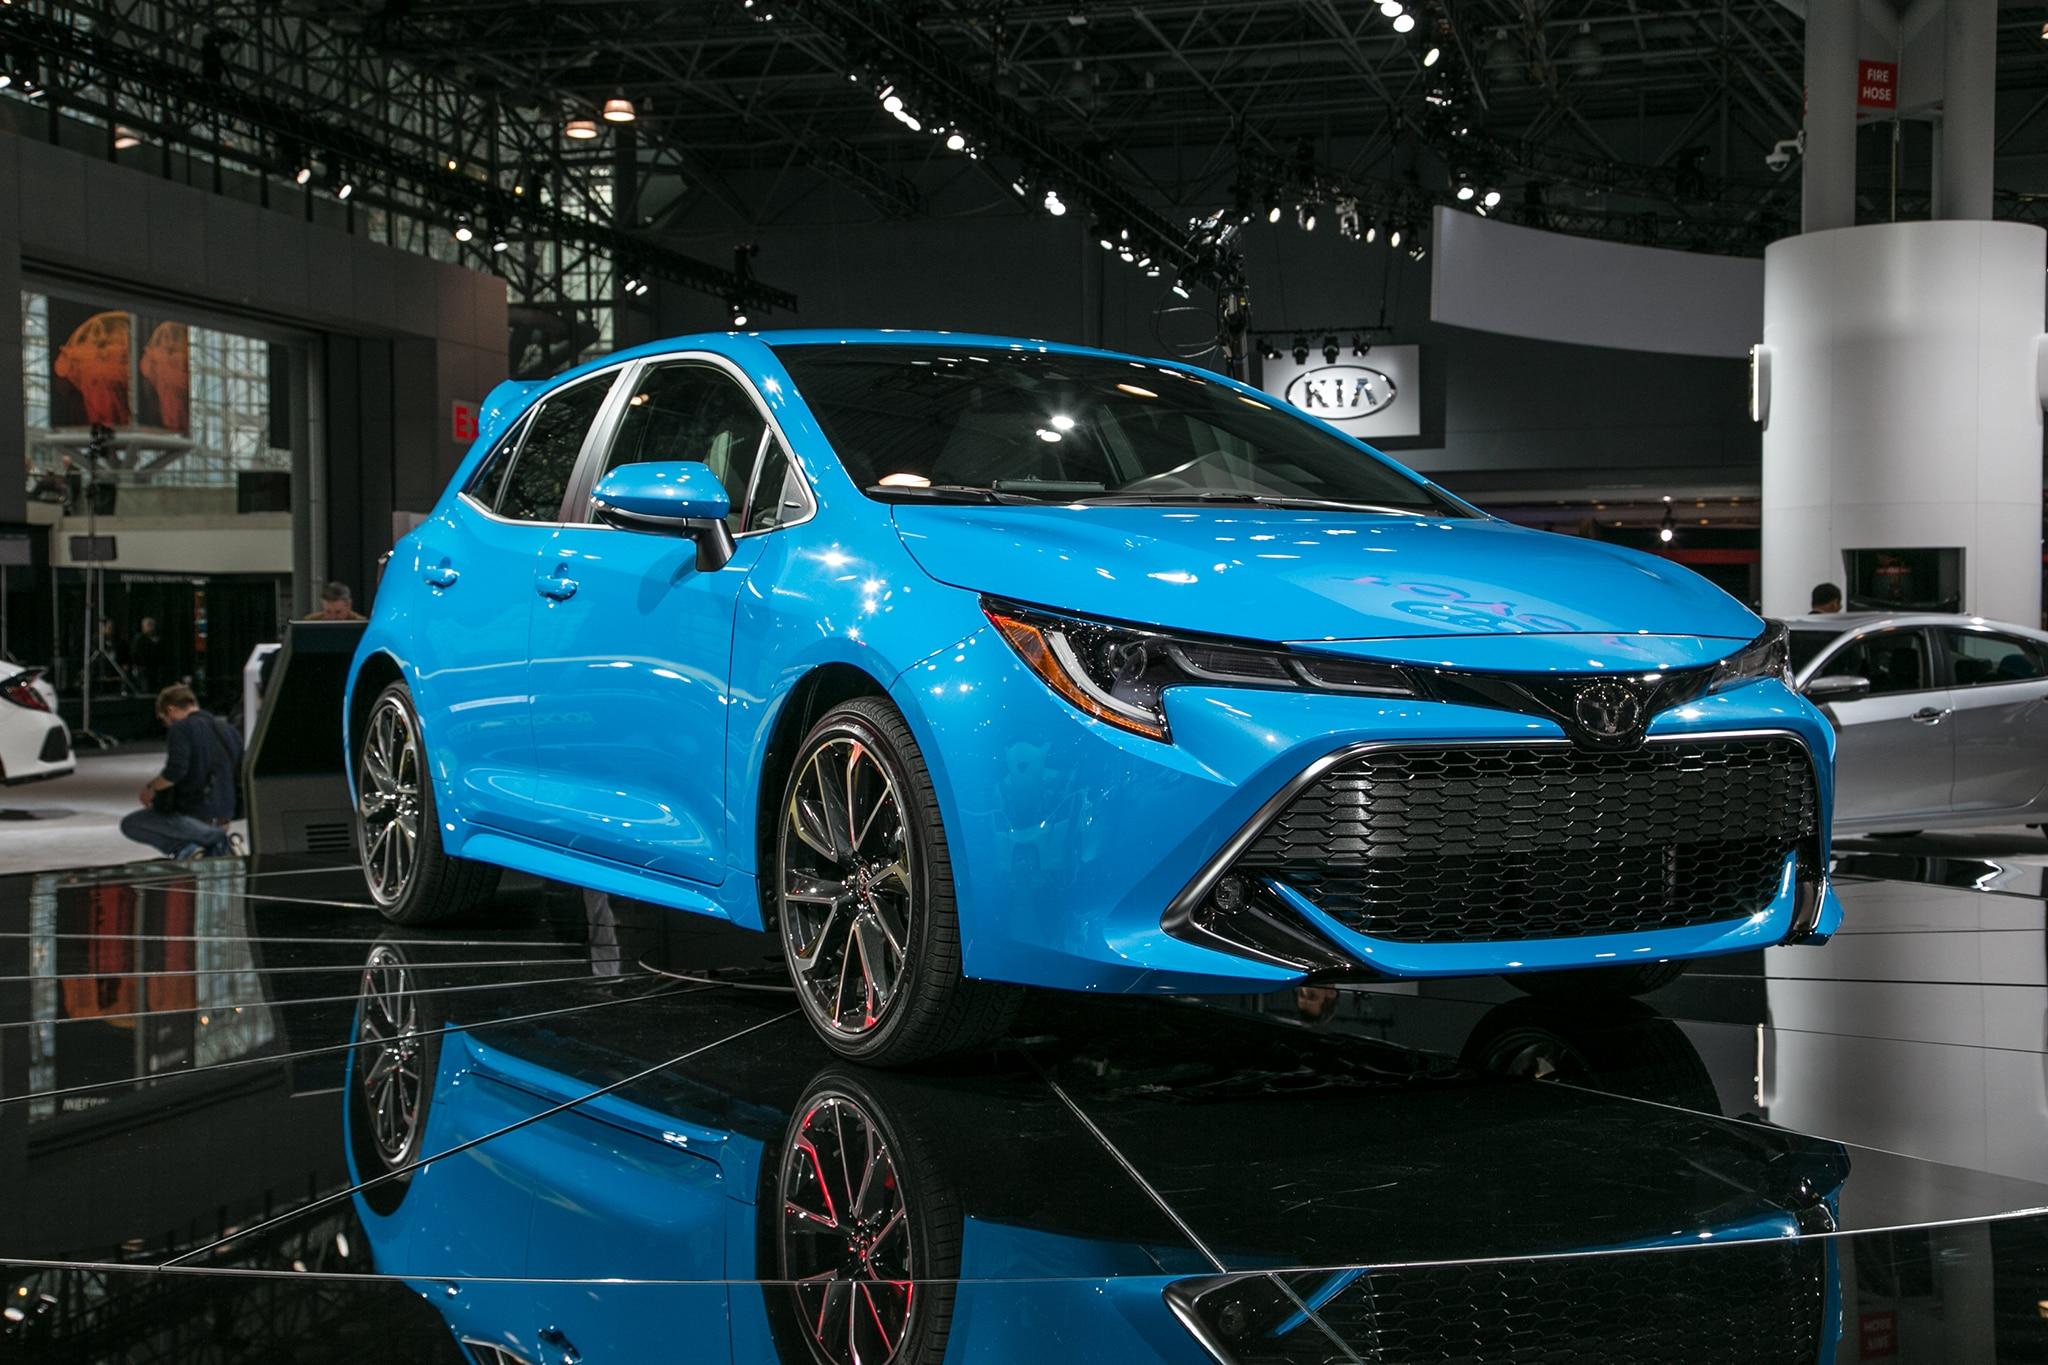 2019 Toyota Corolla Hatchback Hatches Outside Of Javits